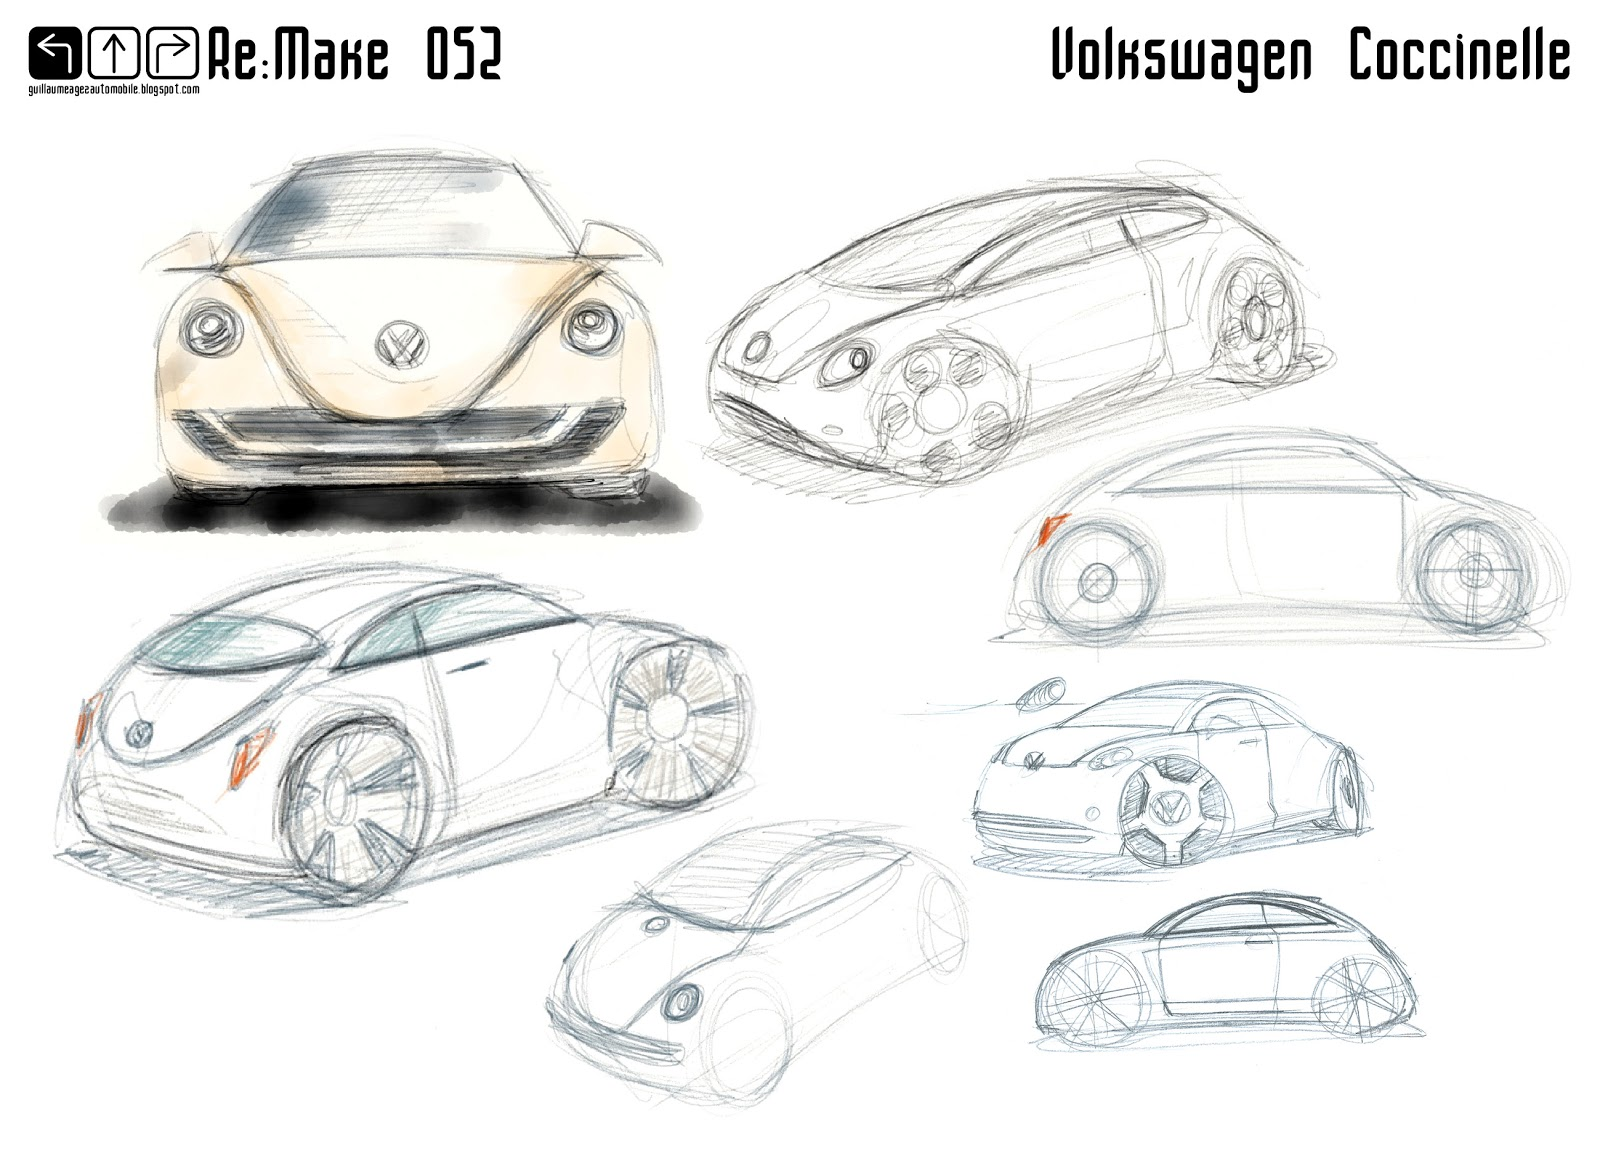 Guillaume Agez Automobile Re Make 052 Volkswagen